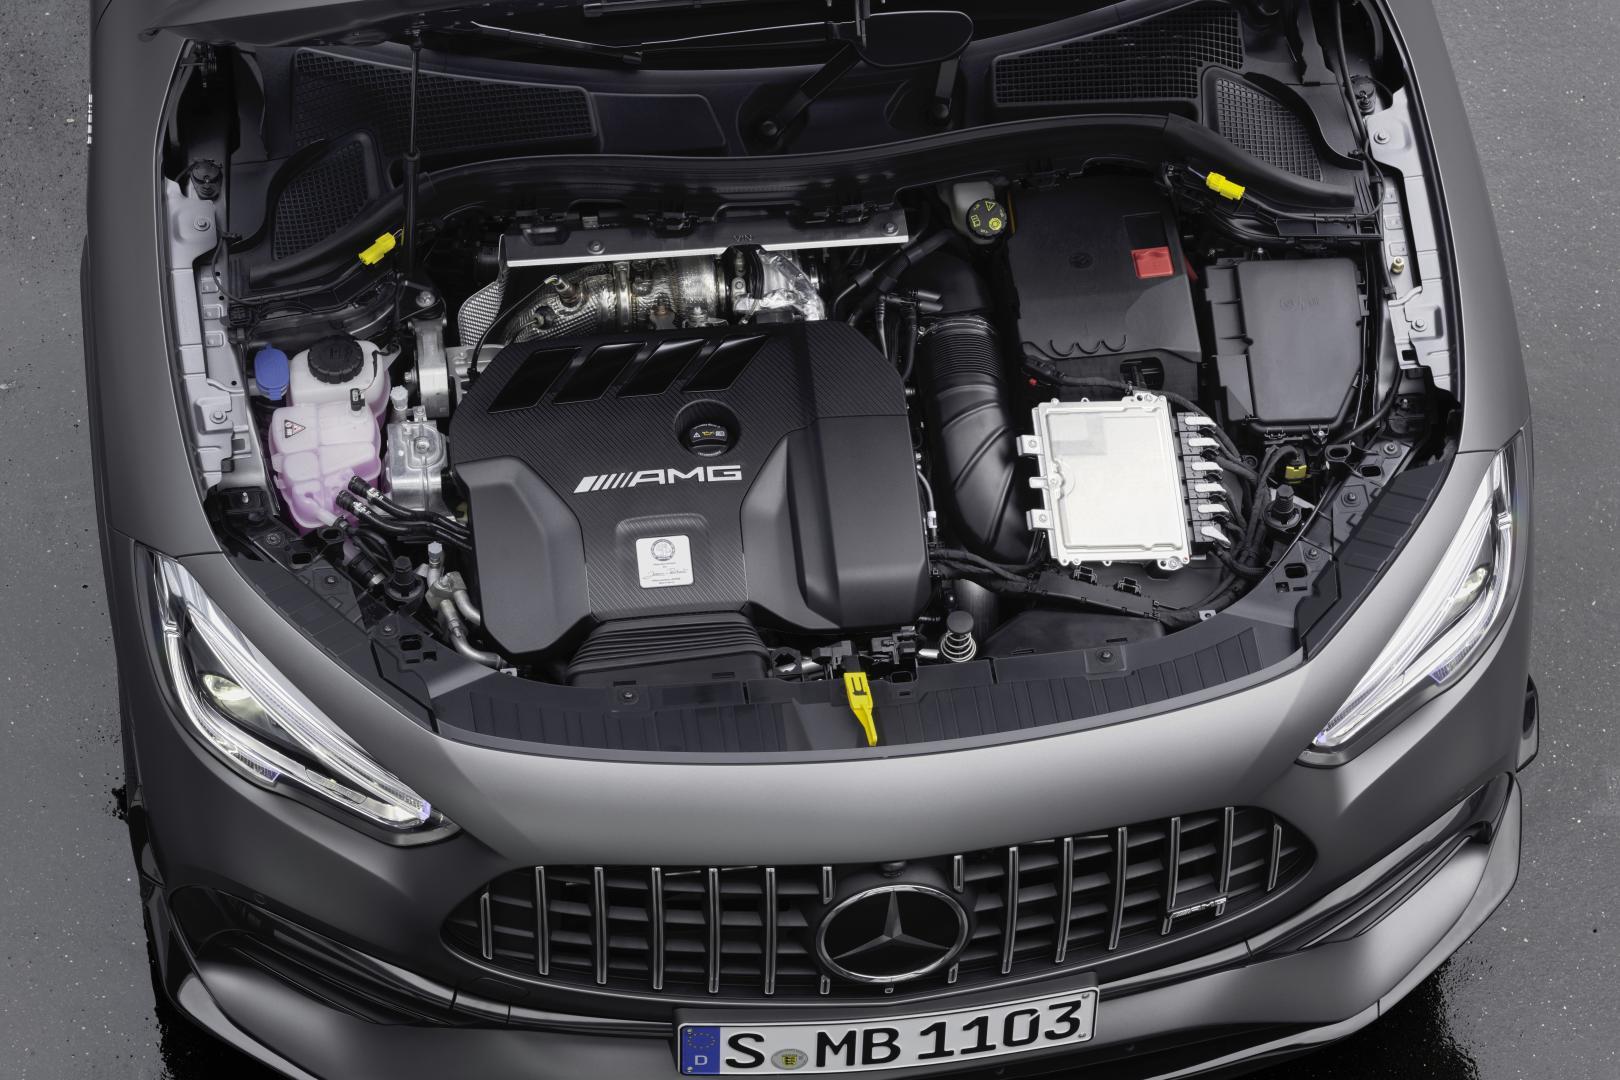 Mercedes-AMG GLA 45 S Motor